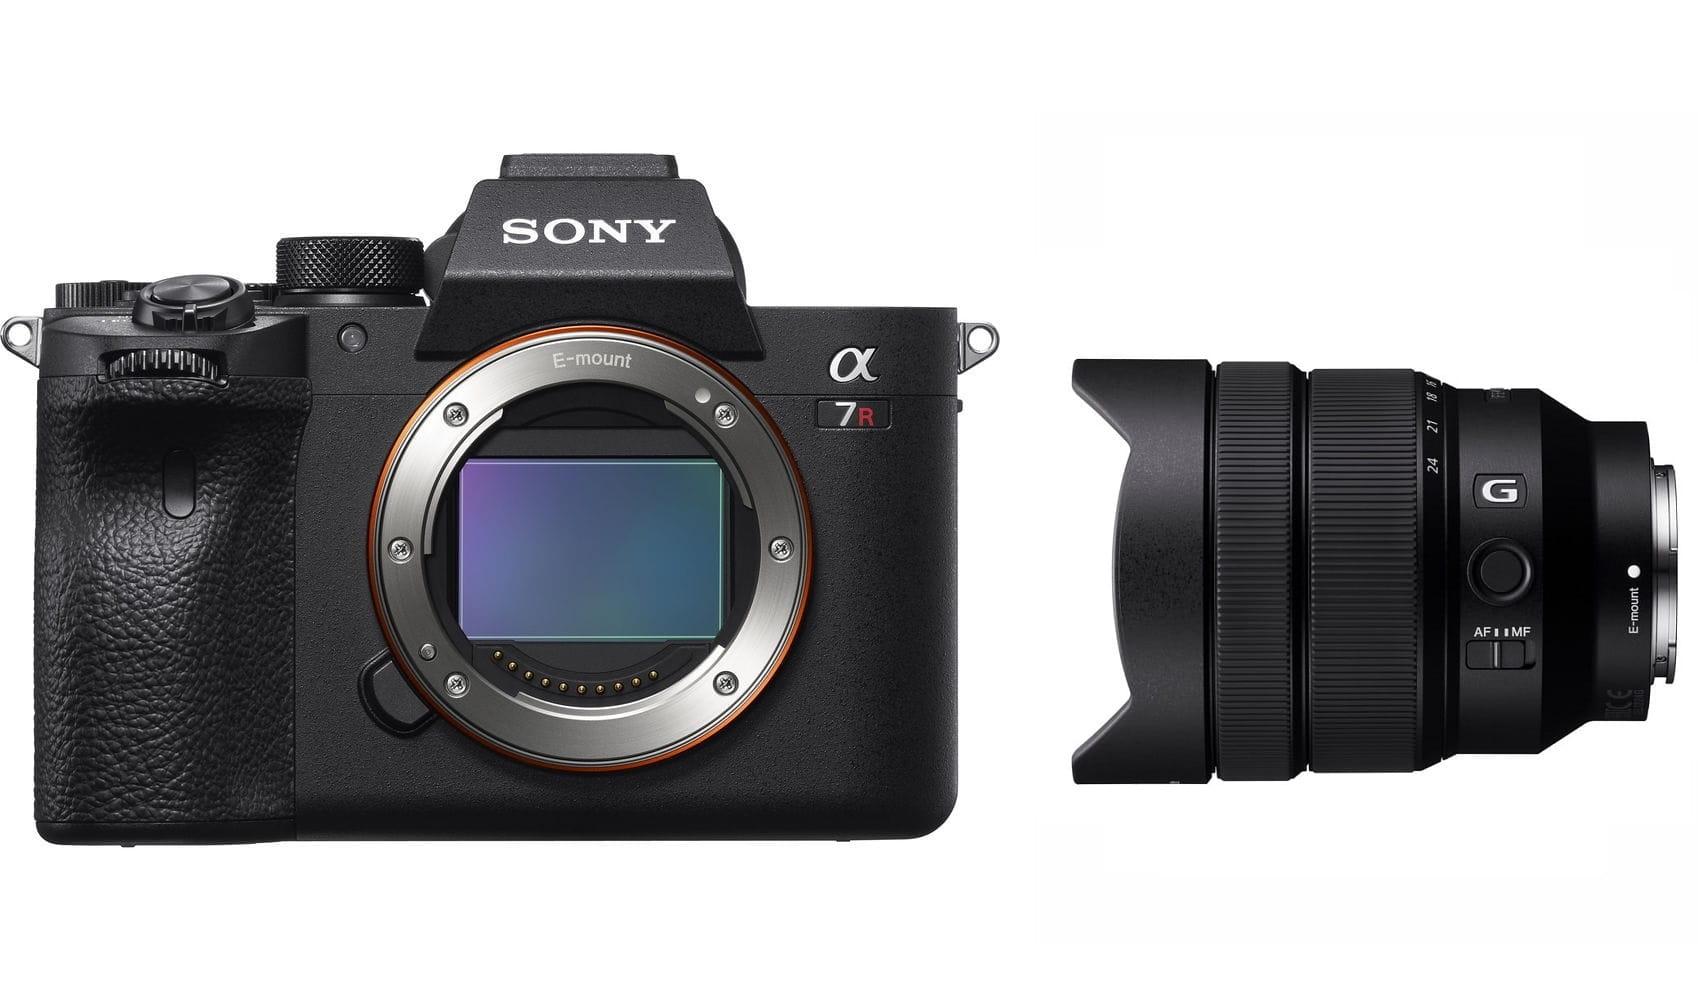 Aparat cyfrowy Sony A7R IVa + obiektyw FE 12-24 mm f/4.0 G - SEL1224G + cashback 1350 i 450 zł